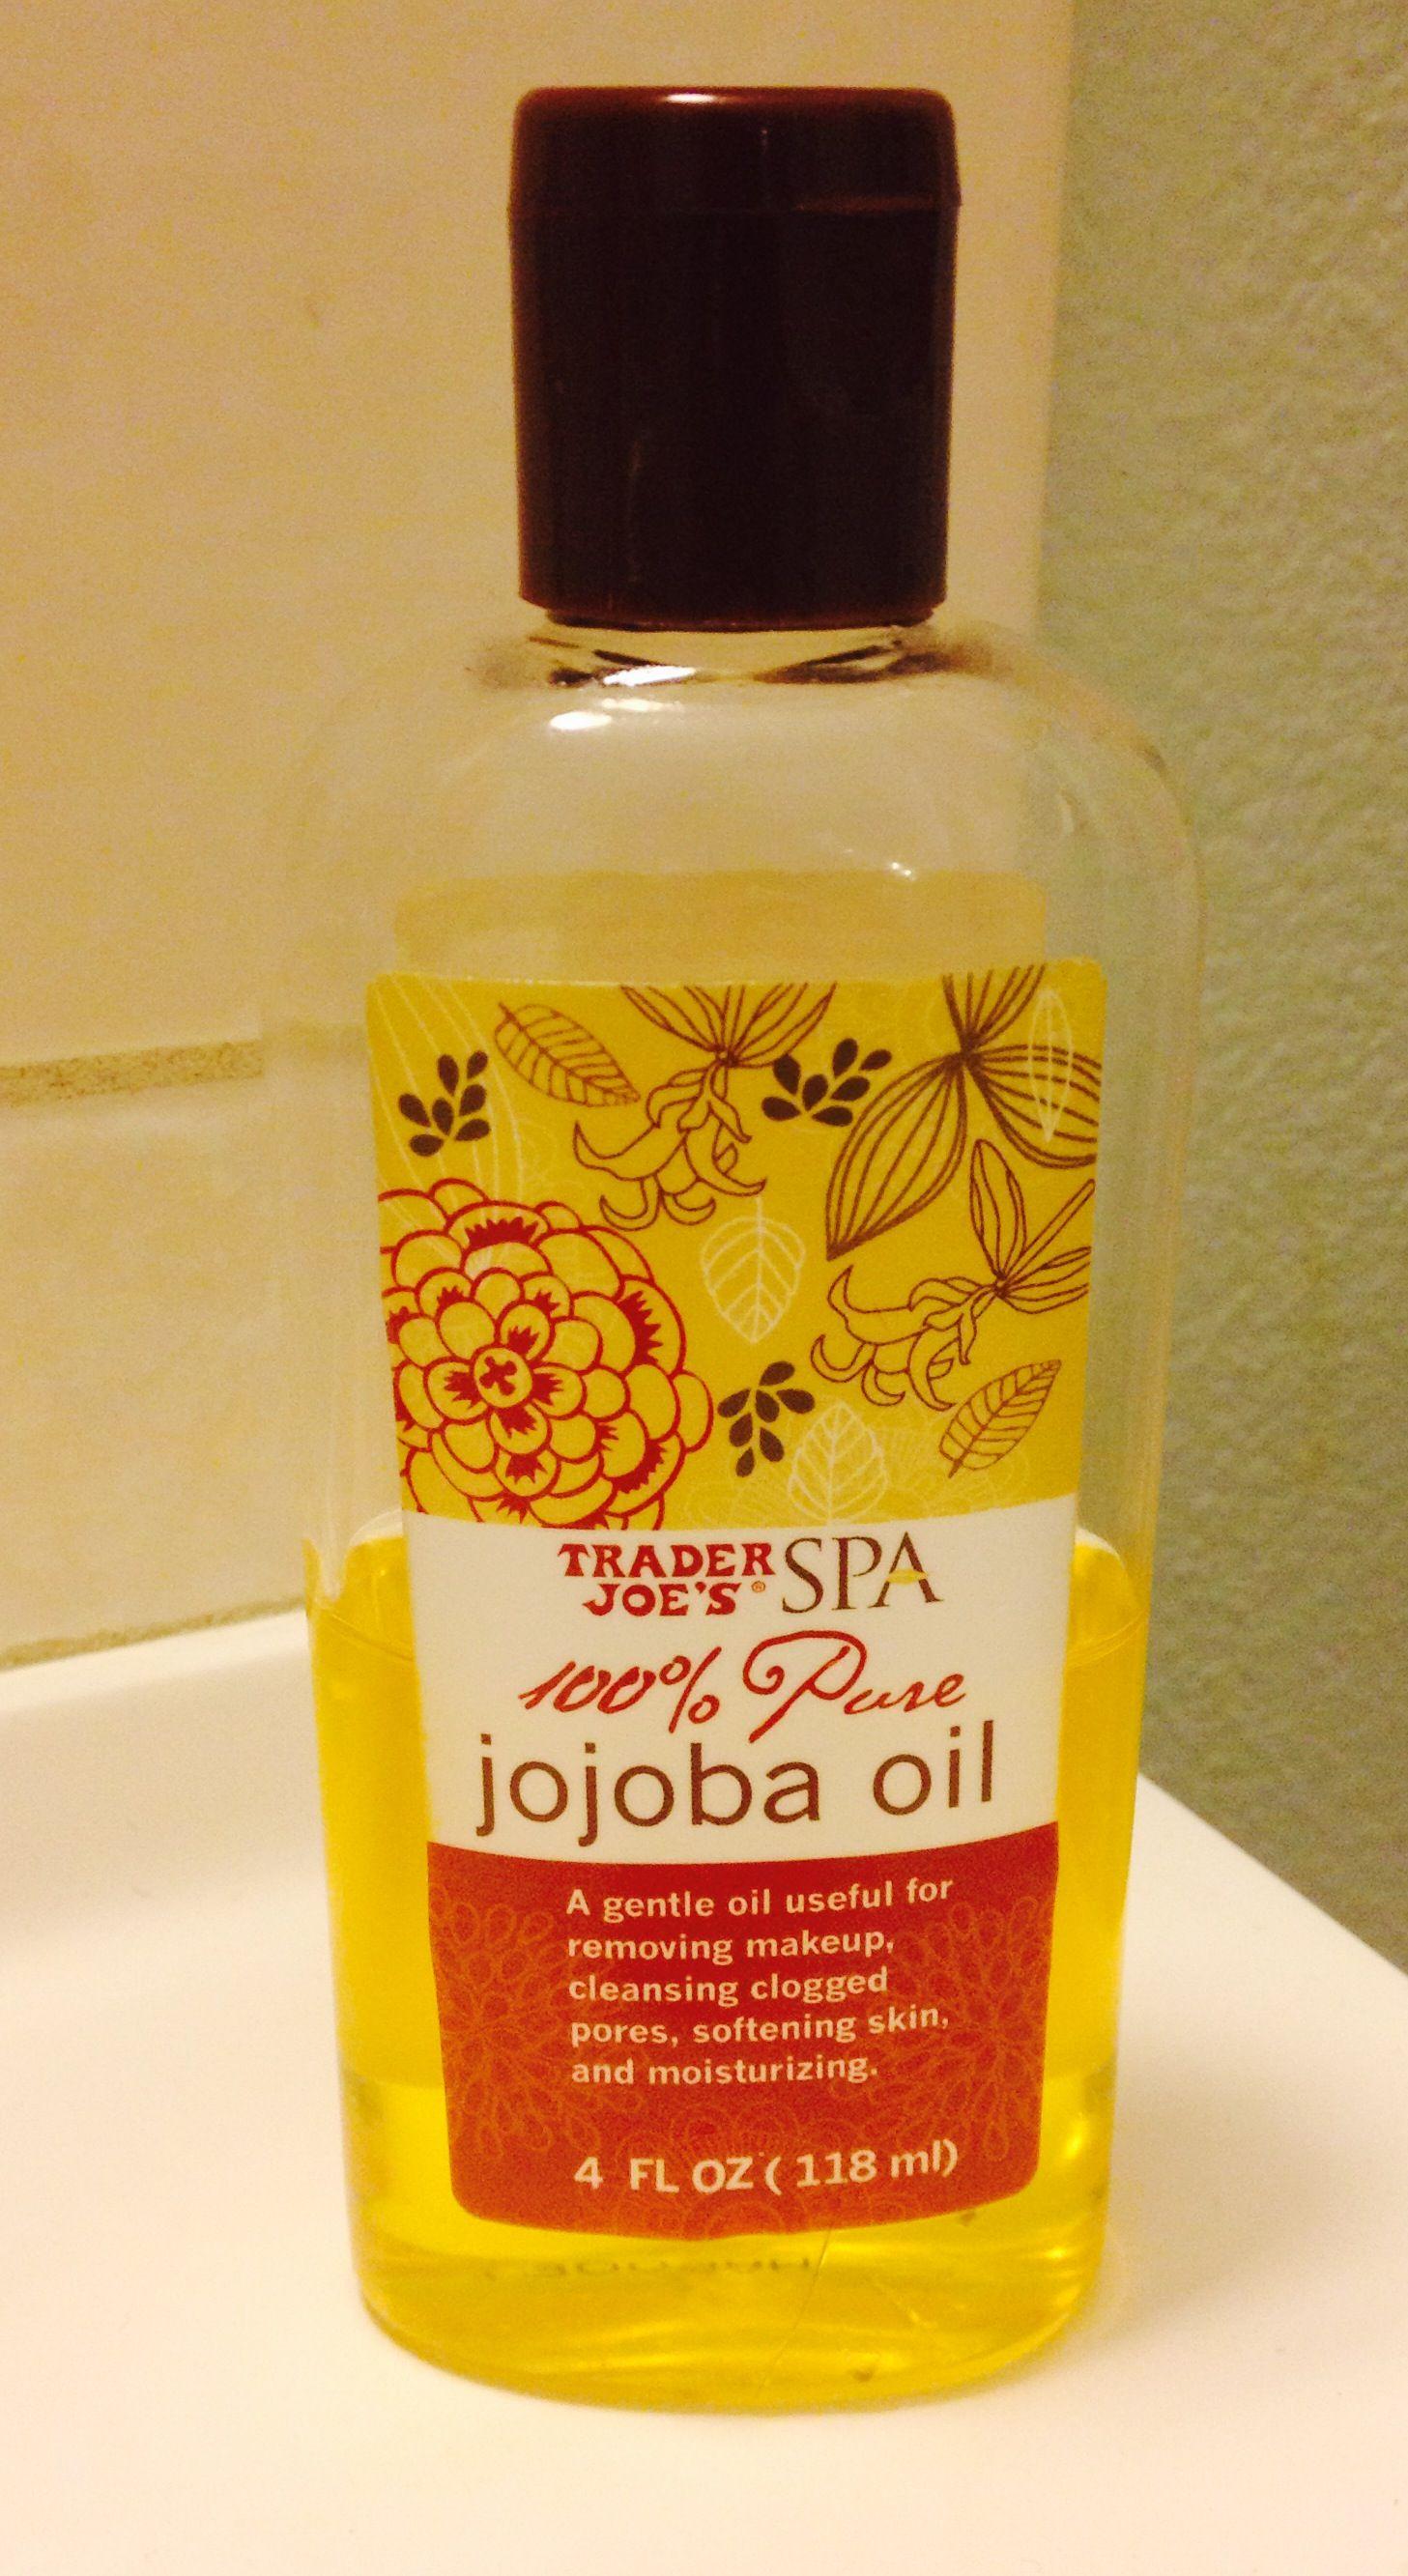 Jojoba oil - Benefits of jojoba oil on hair and skin